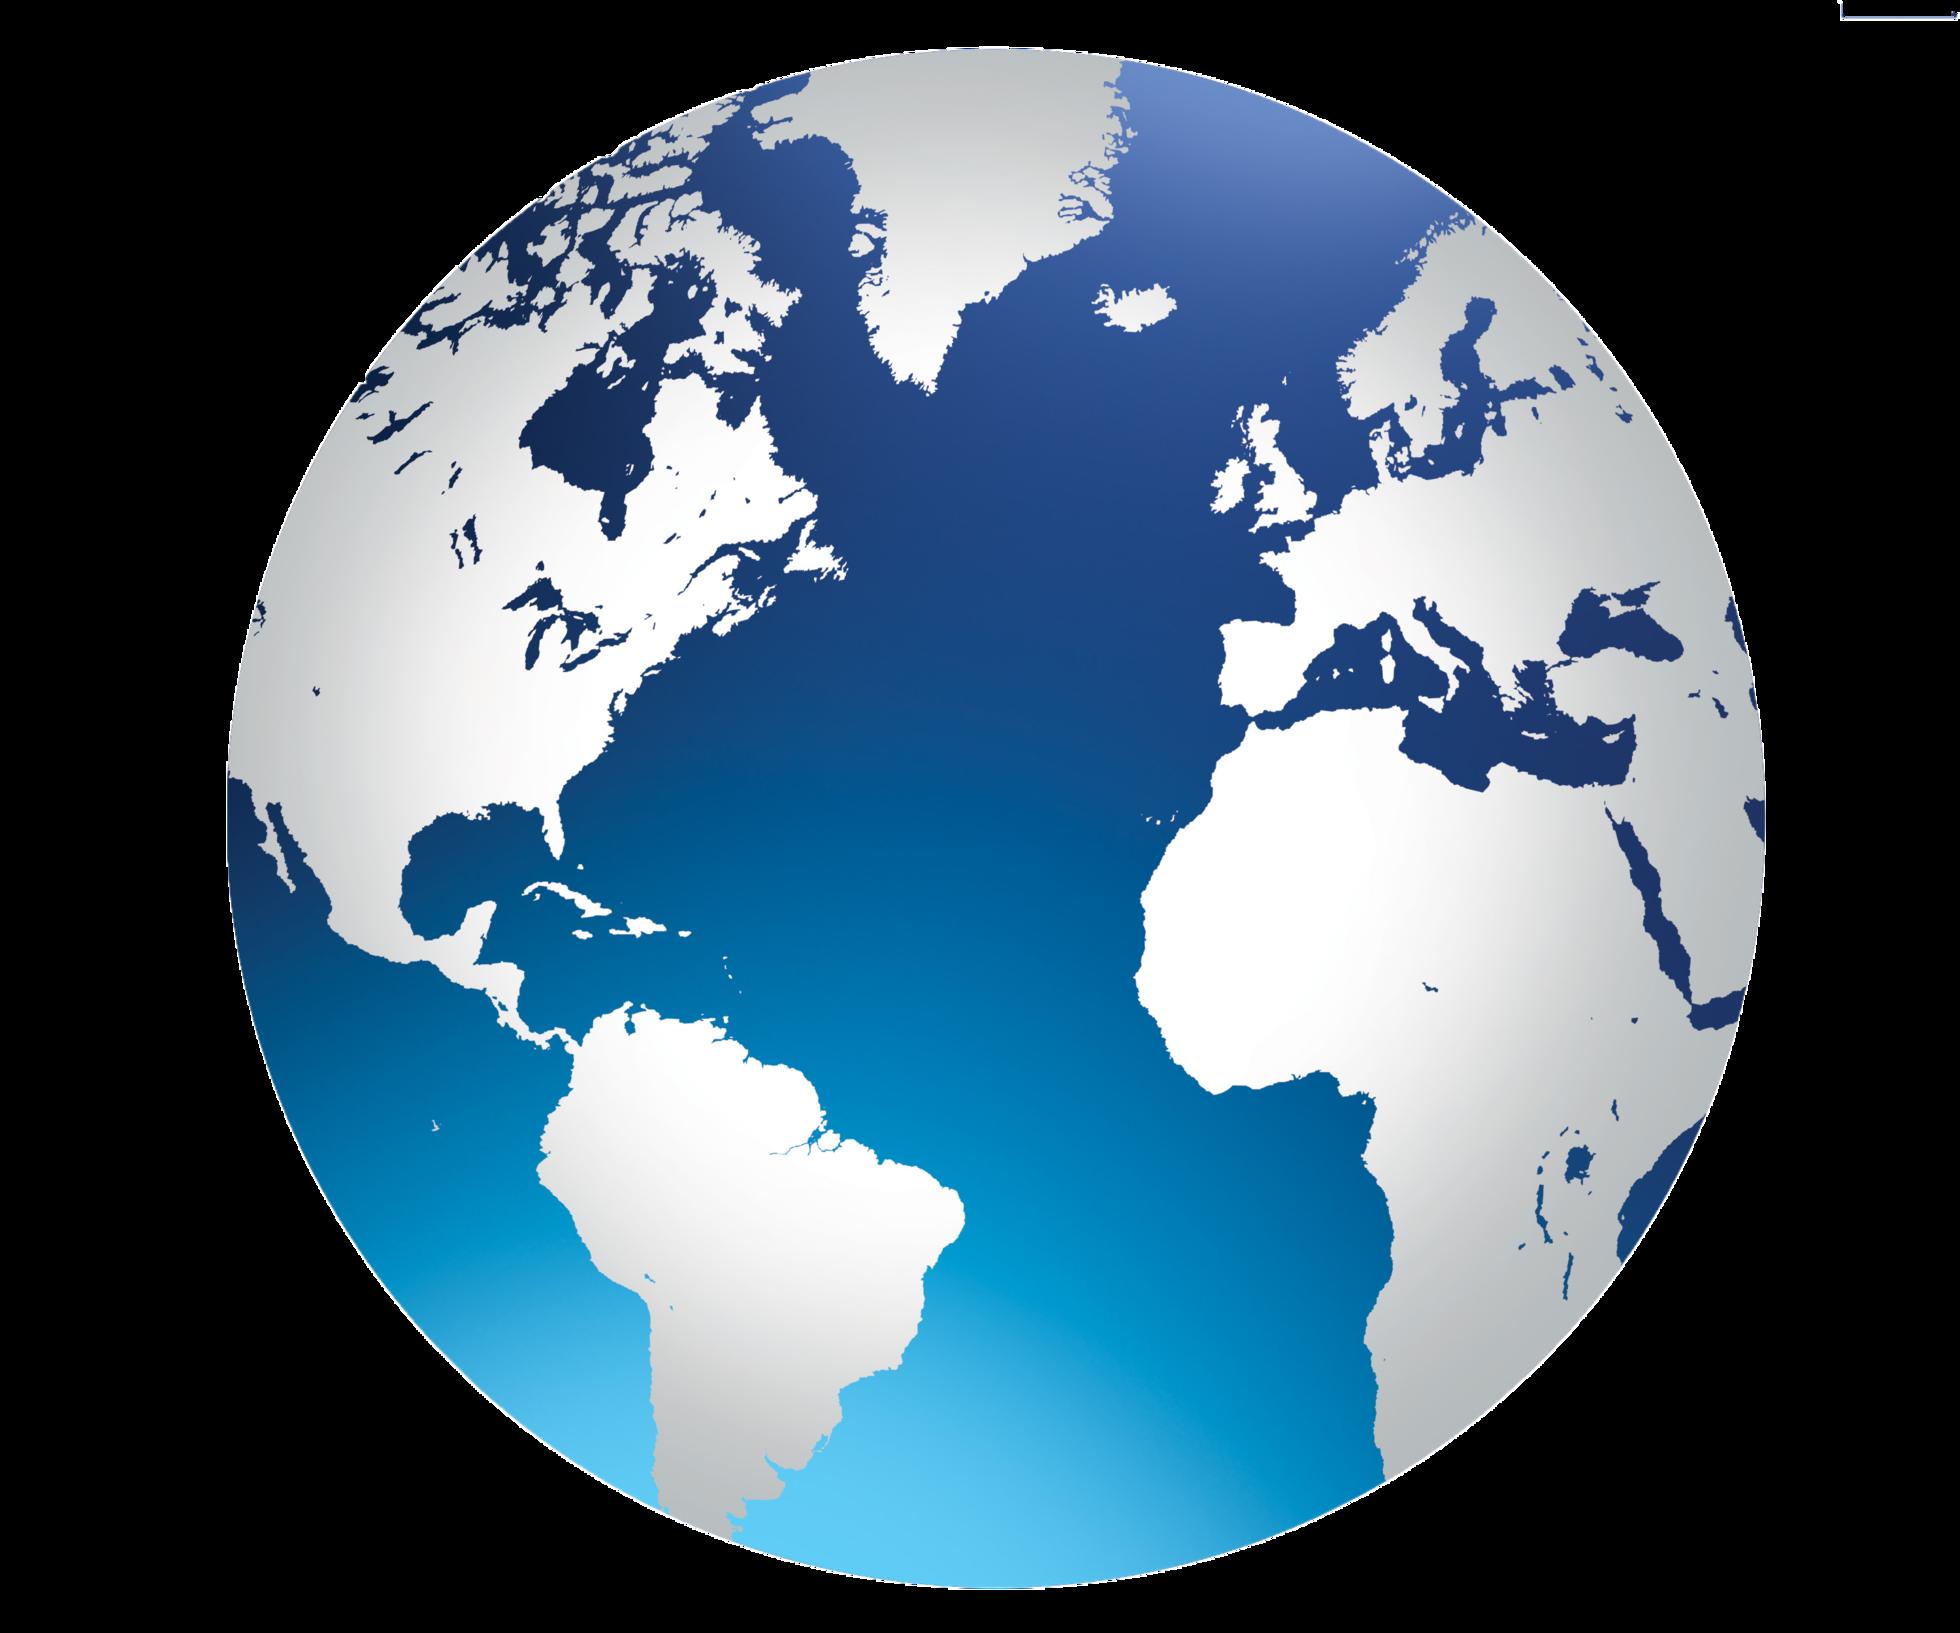 jpg transparent stock hd png image of world globe transparent